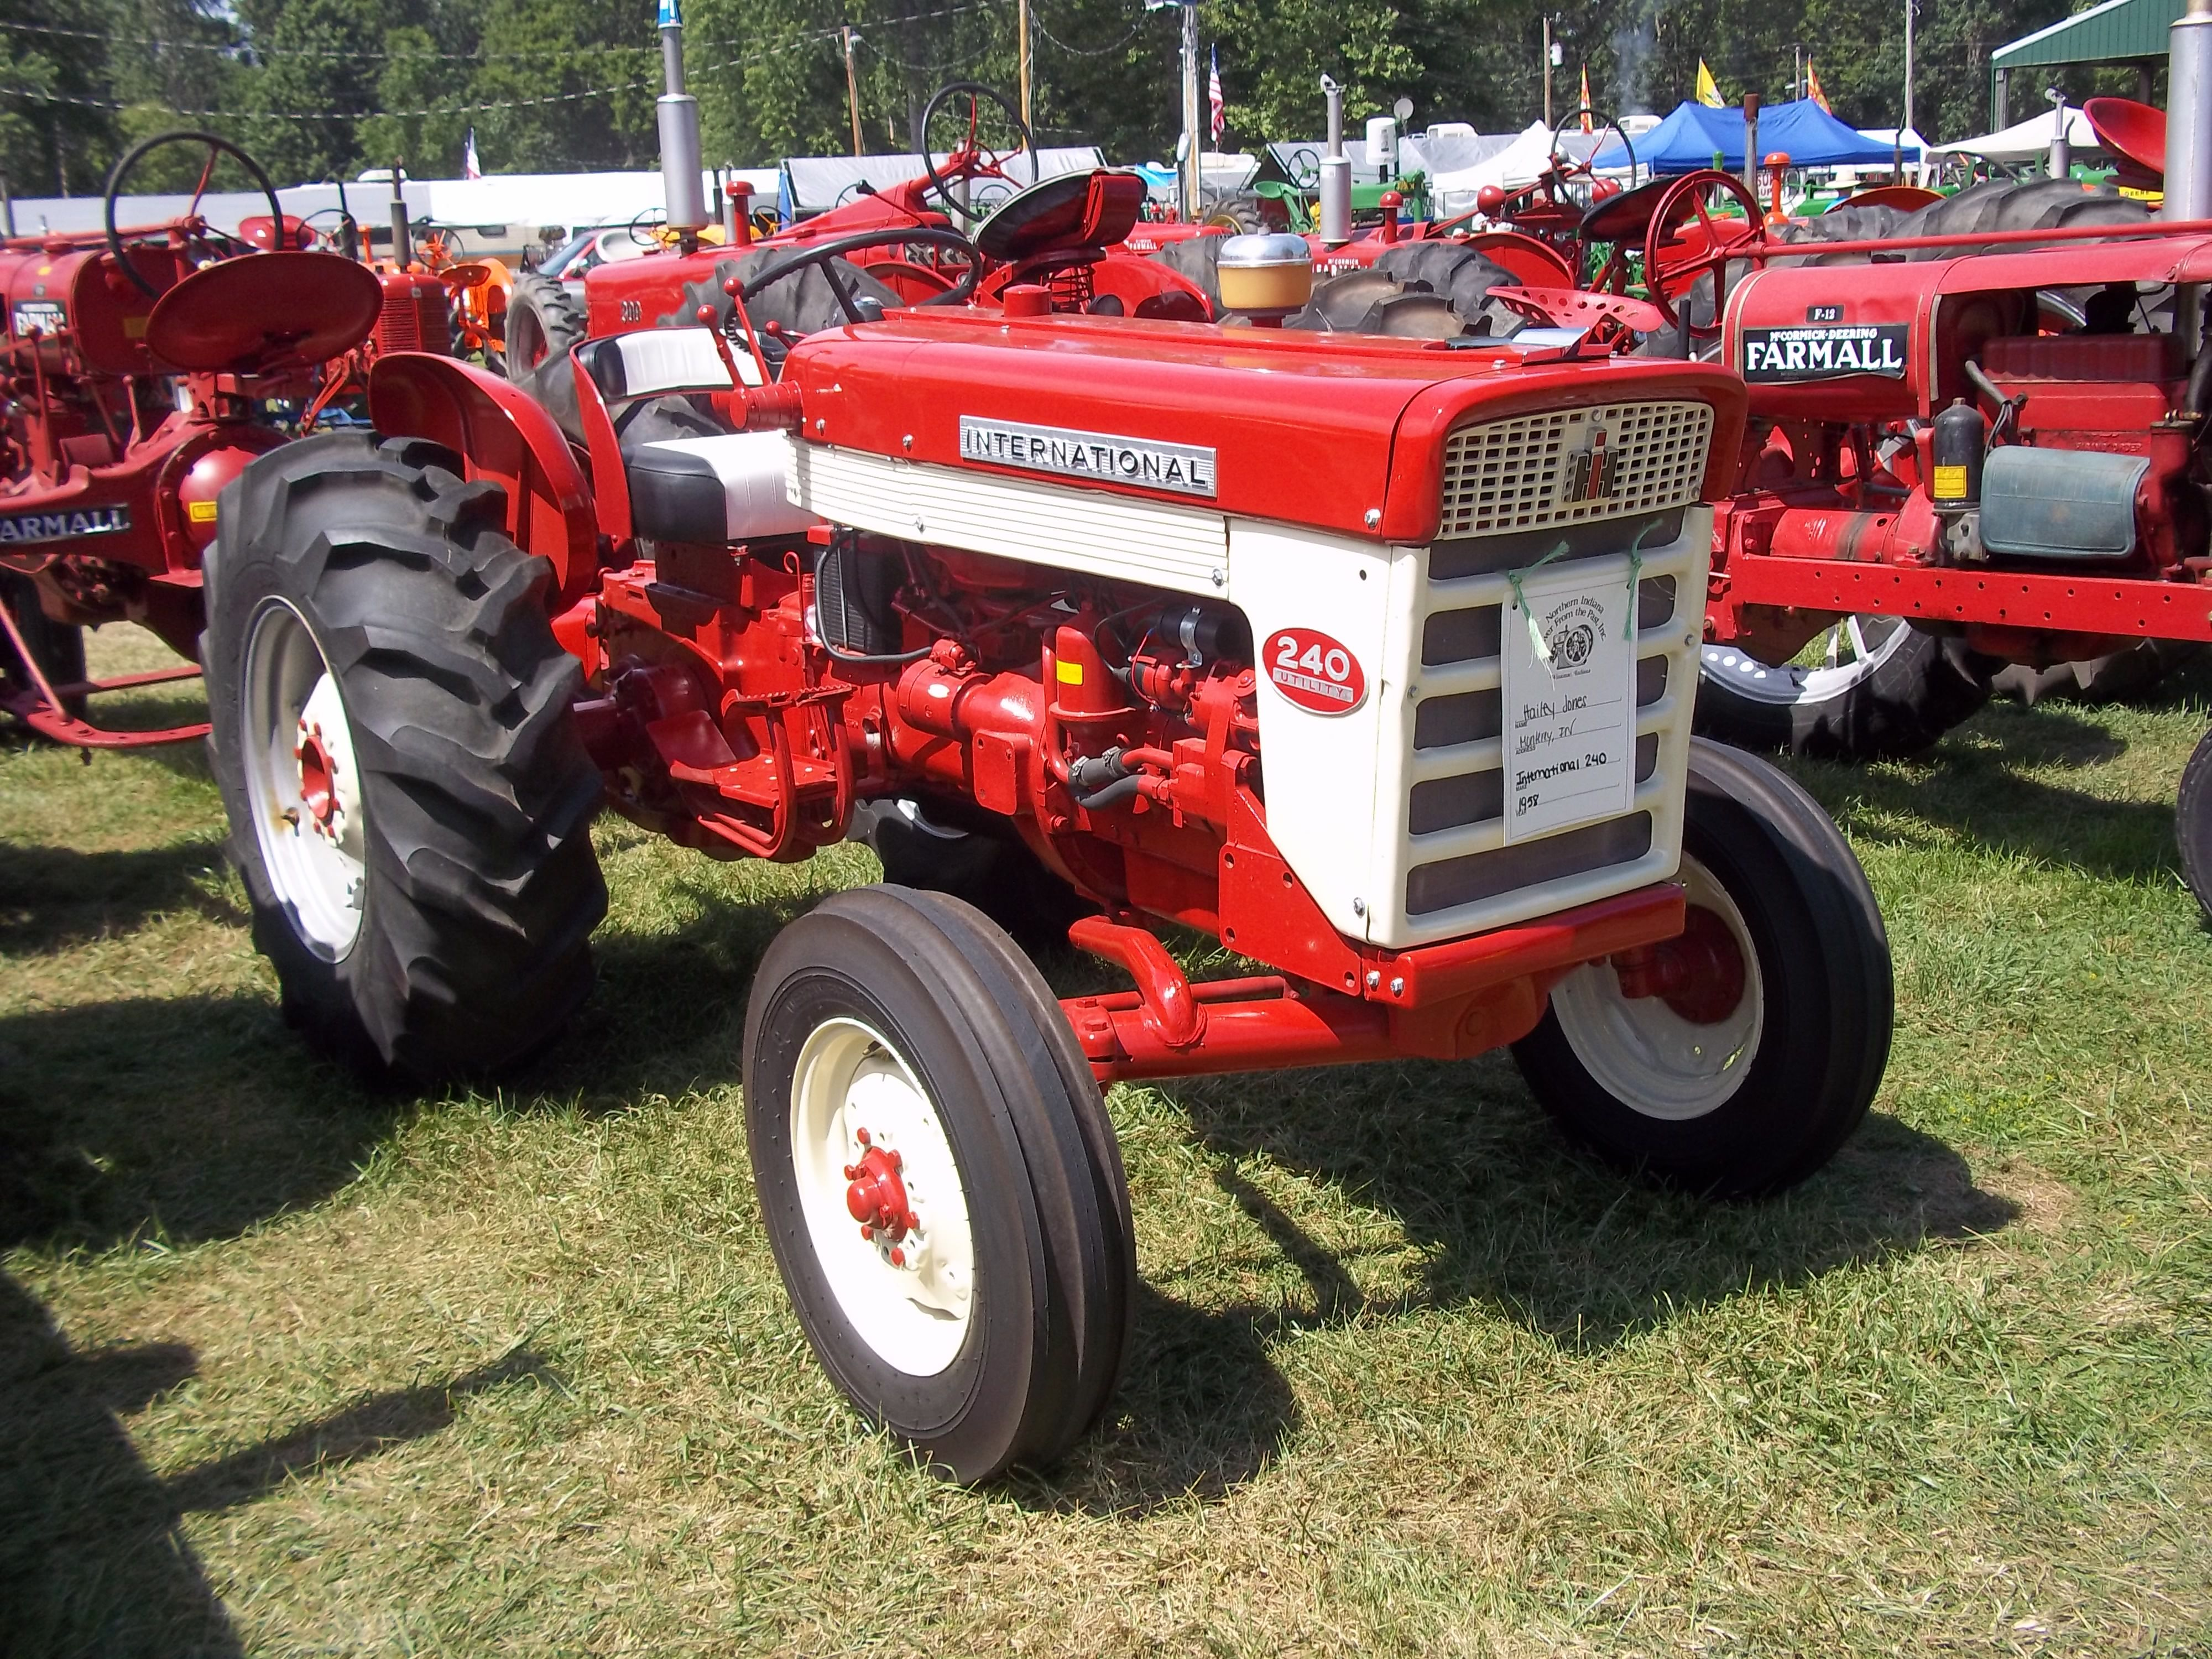 International 240 utility tractor